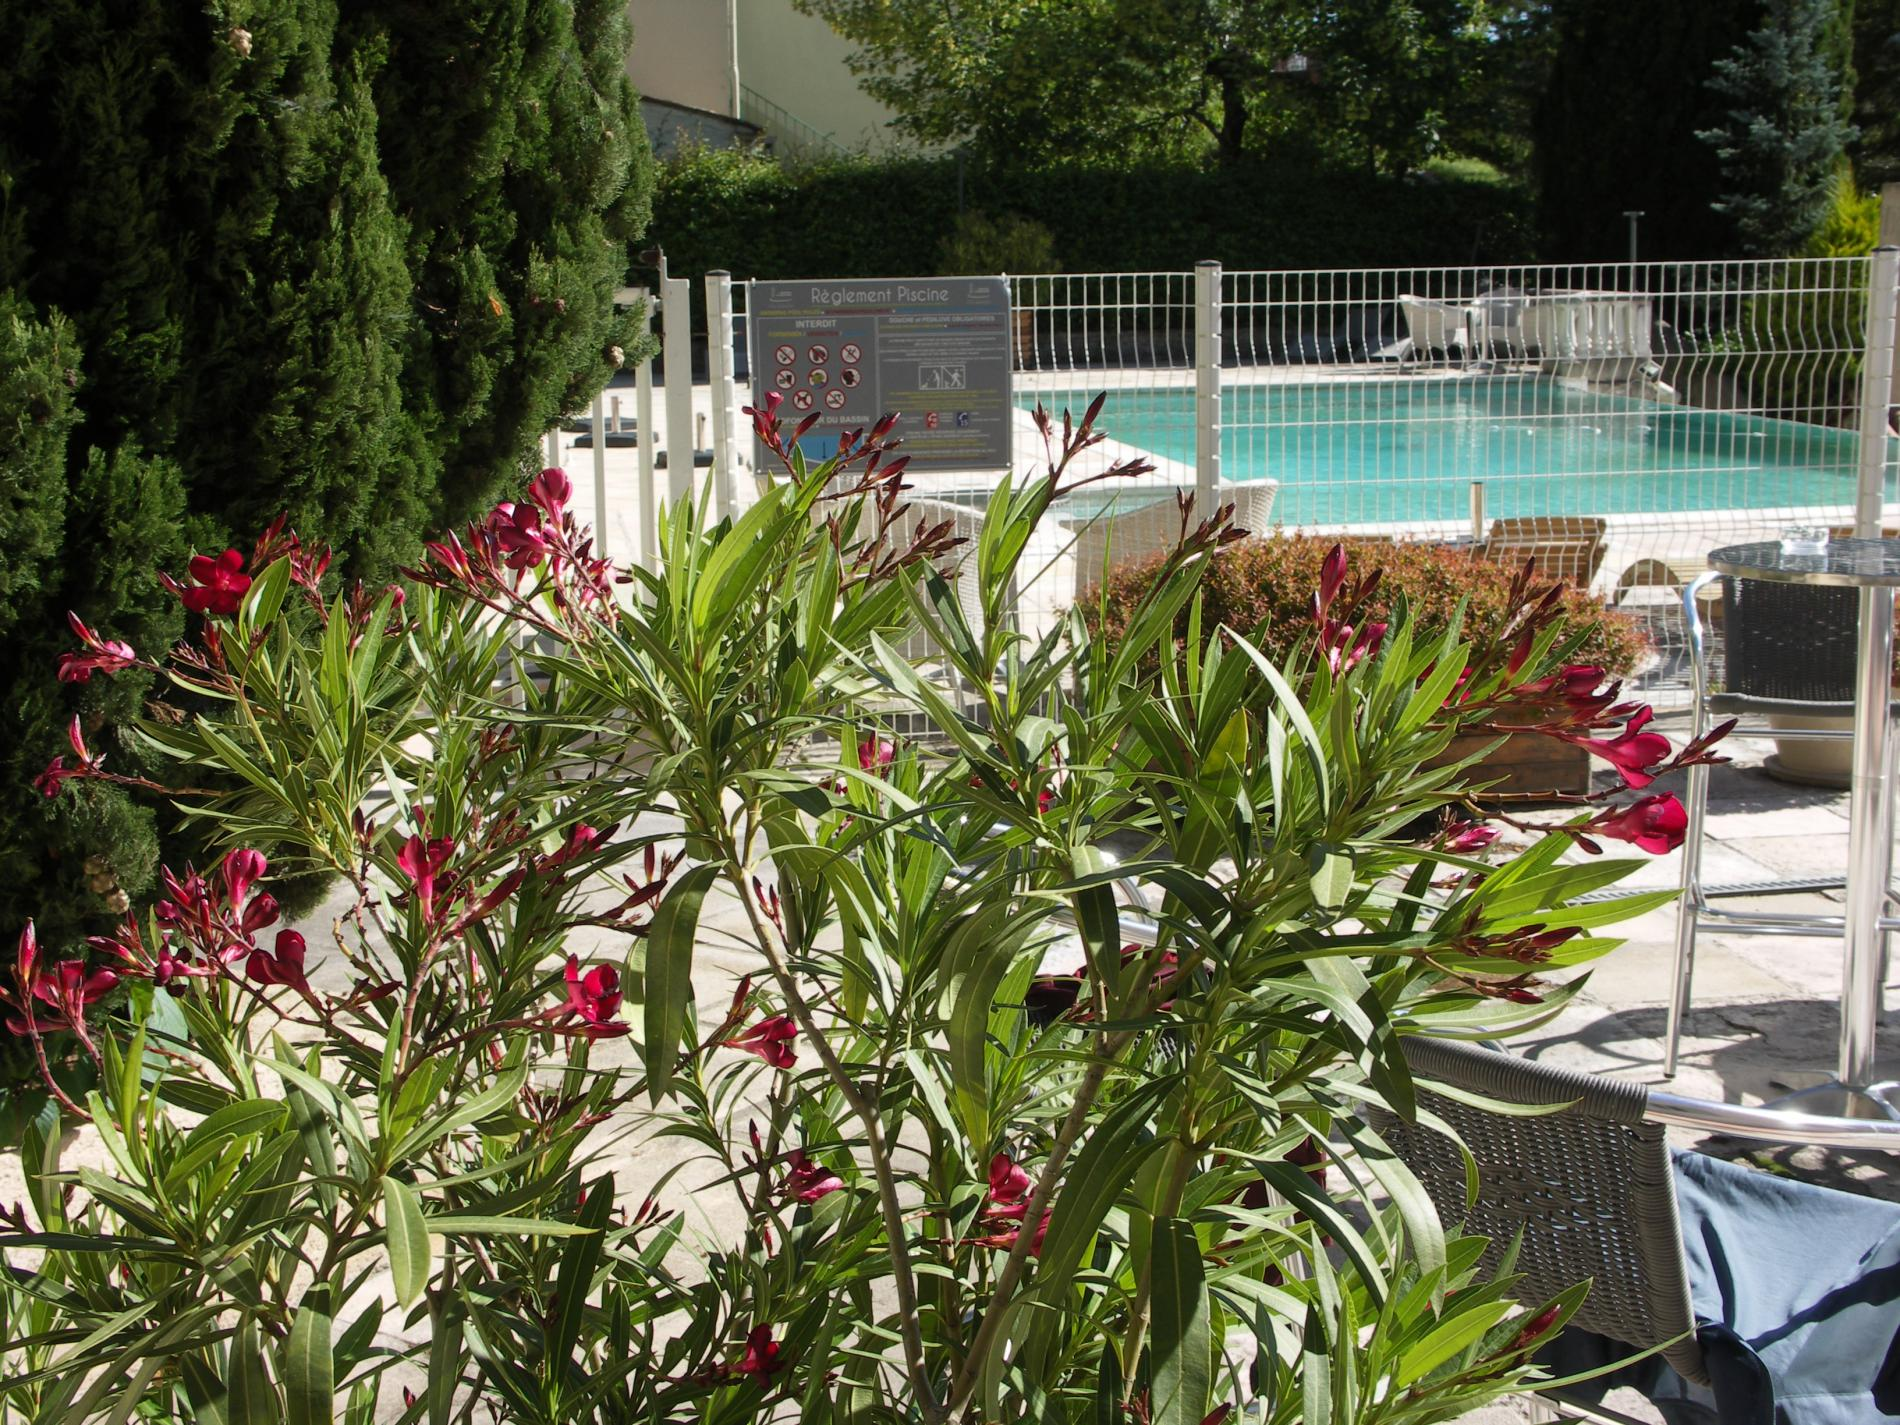 Abords piscine et règlement